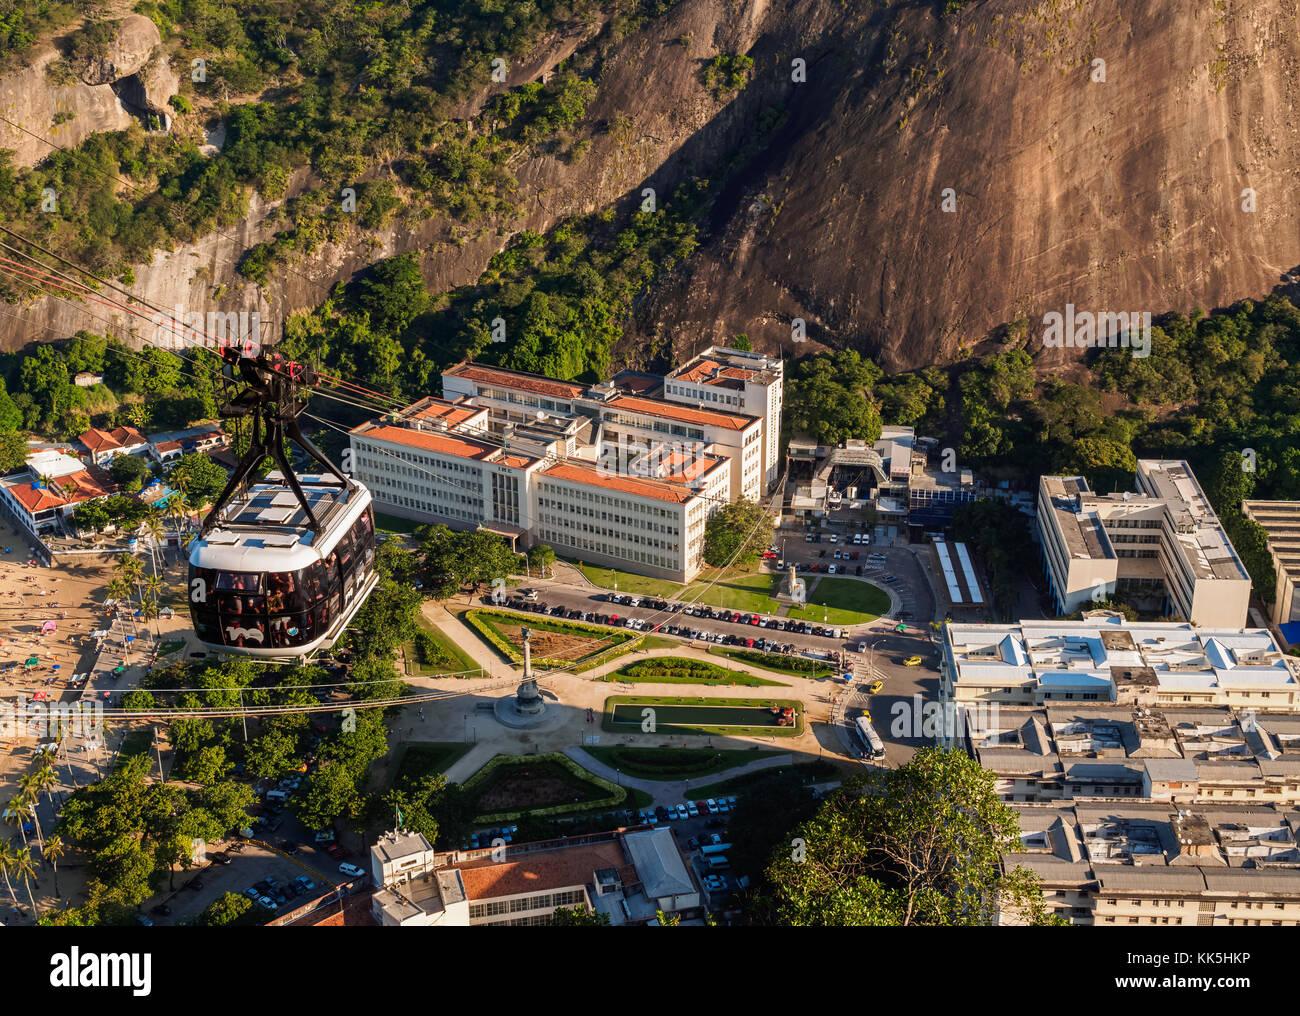 Cable Car to Morro da Urca and Sugarloaf Mountain, Rio de Janeiro, Brazil Stock Photo